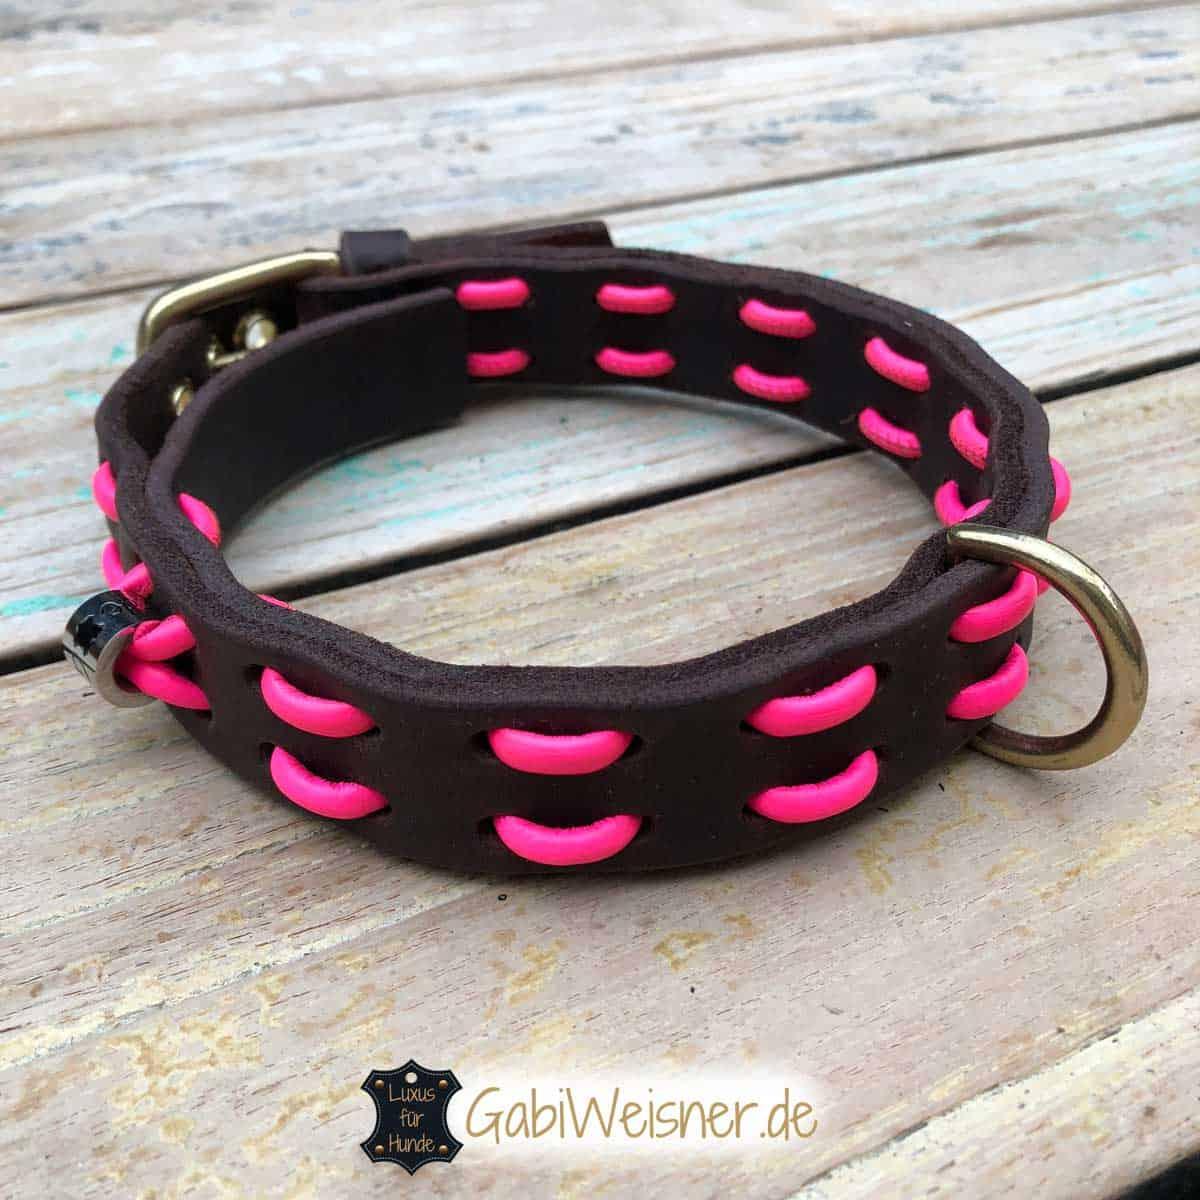 hundehalsband neon pink leder in schwarz oder braun 2 5 cm breit. Black Bedroom Furniture Sets. Home Design Ideas